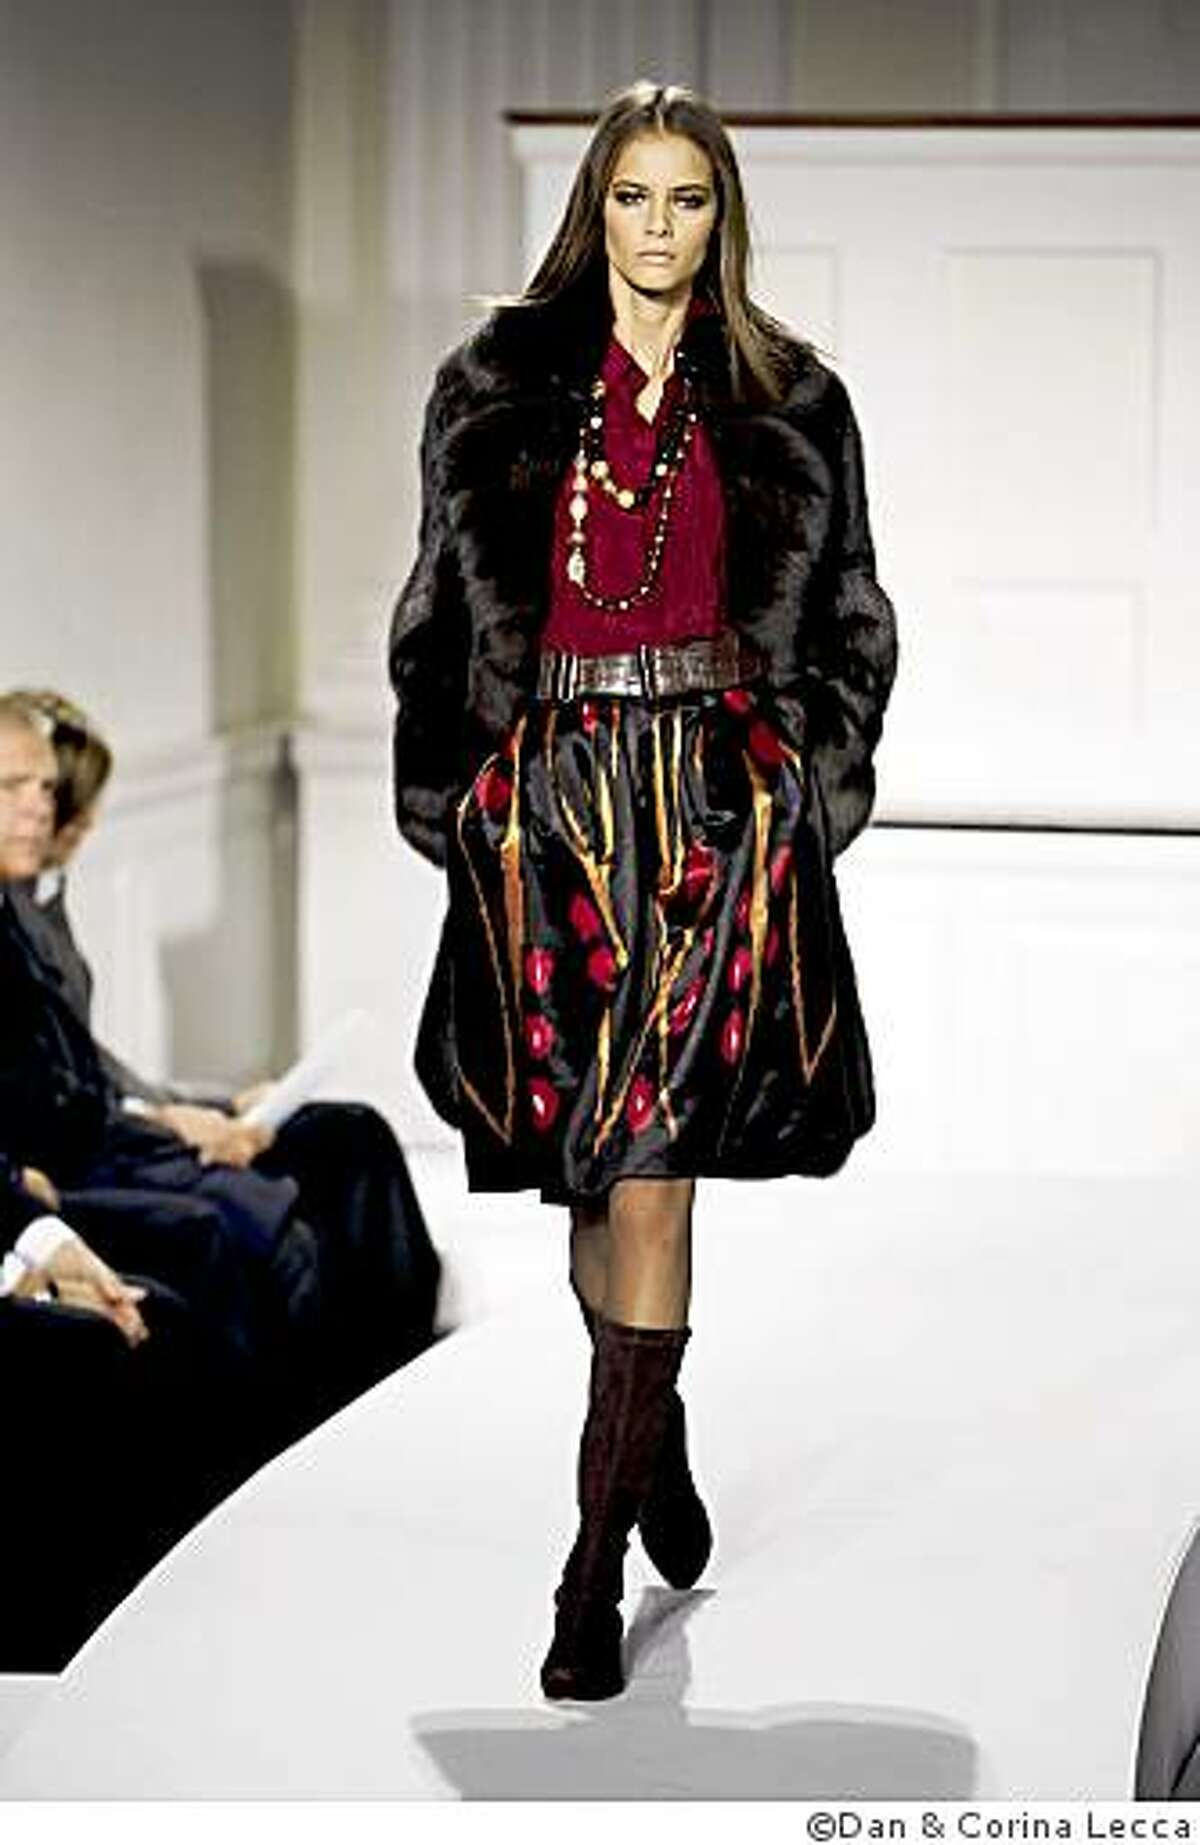 Ikat skirt from Oscar de la Renta 2008 Fall Collection